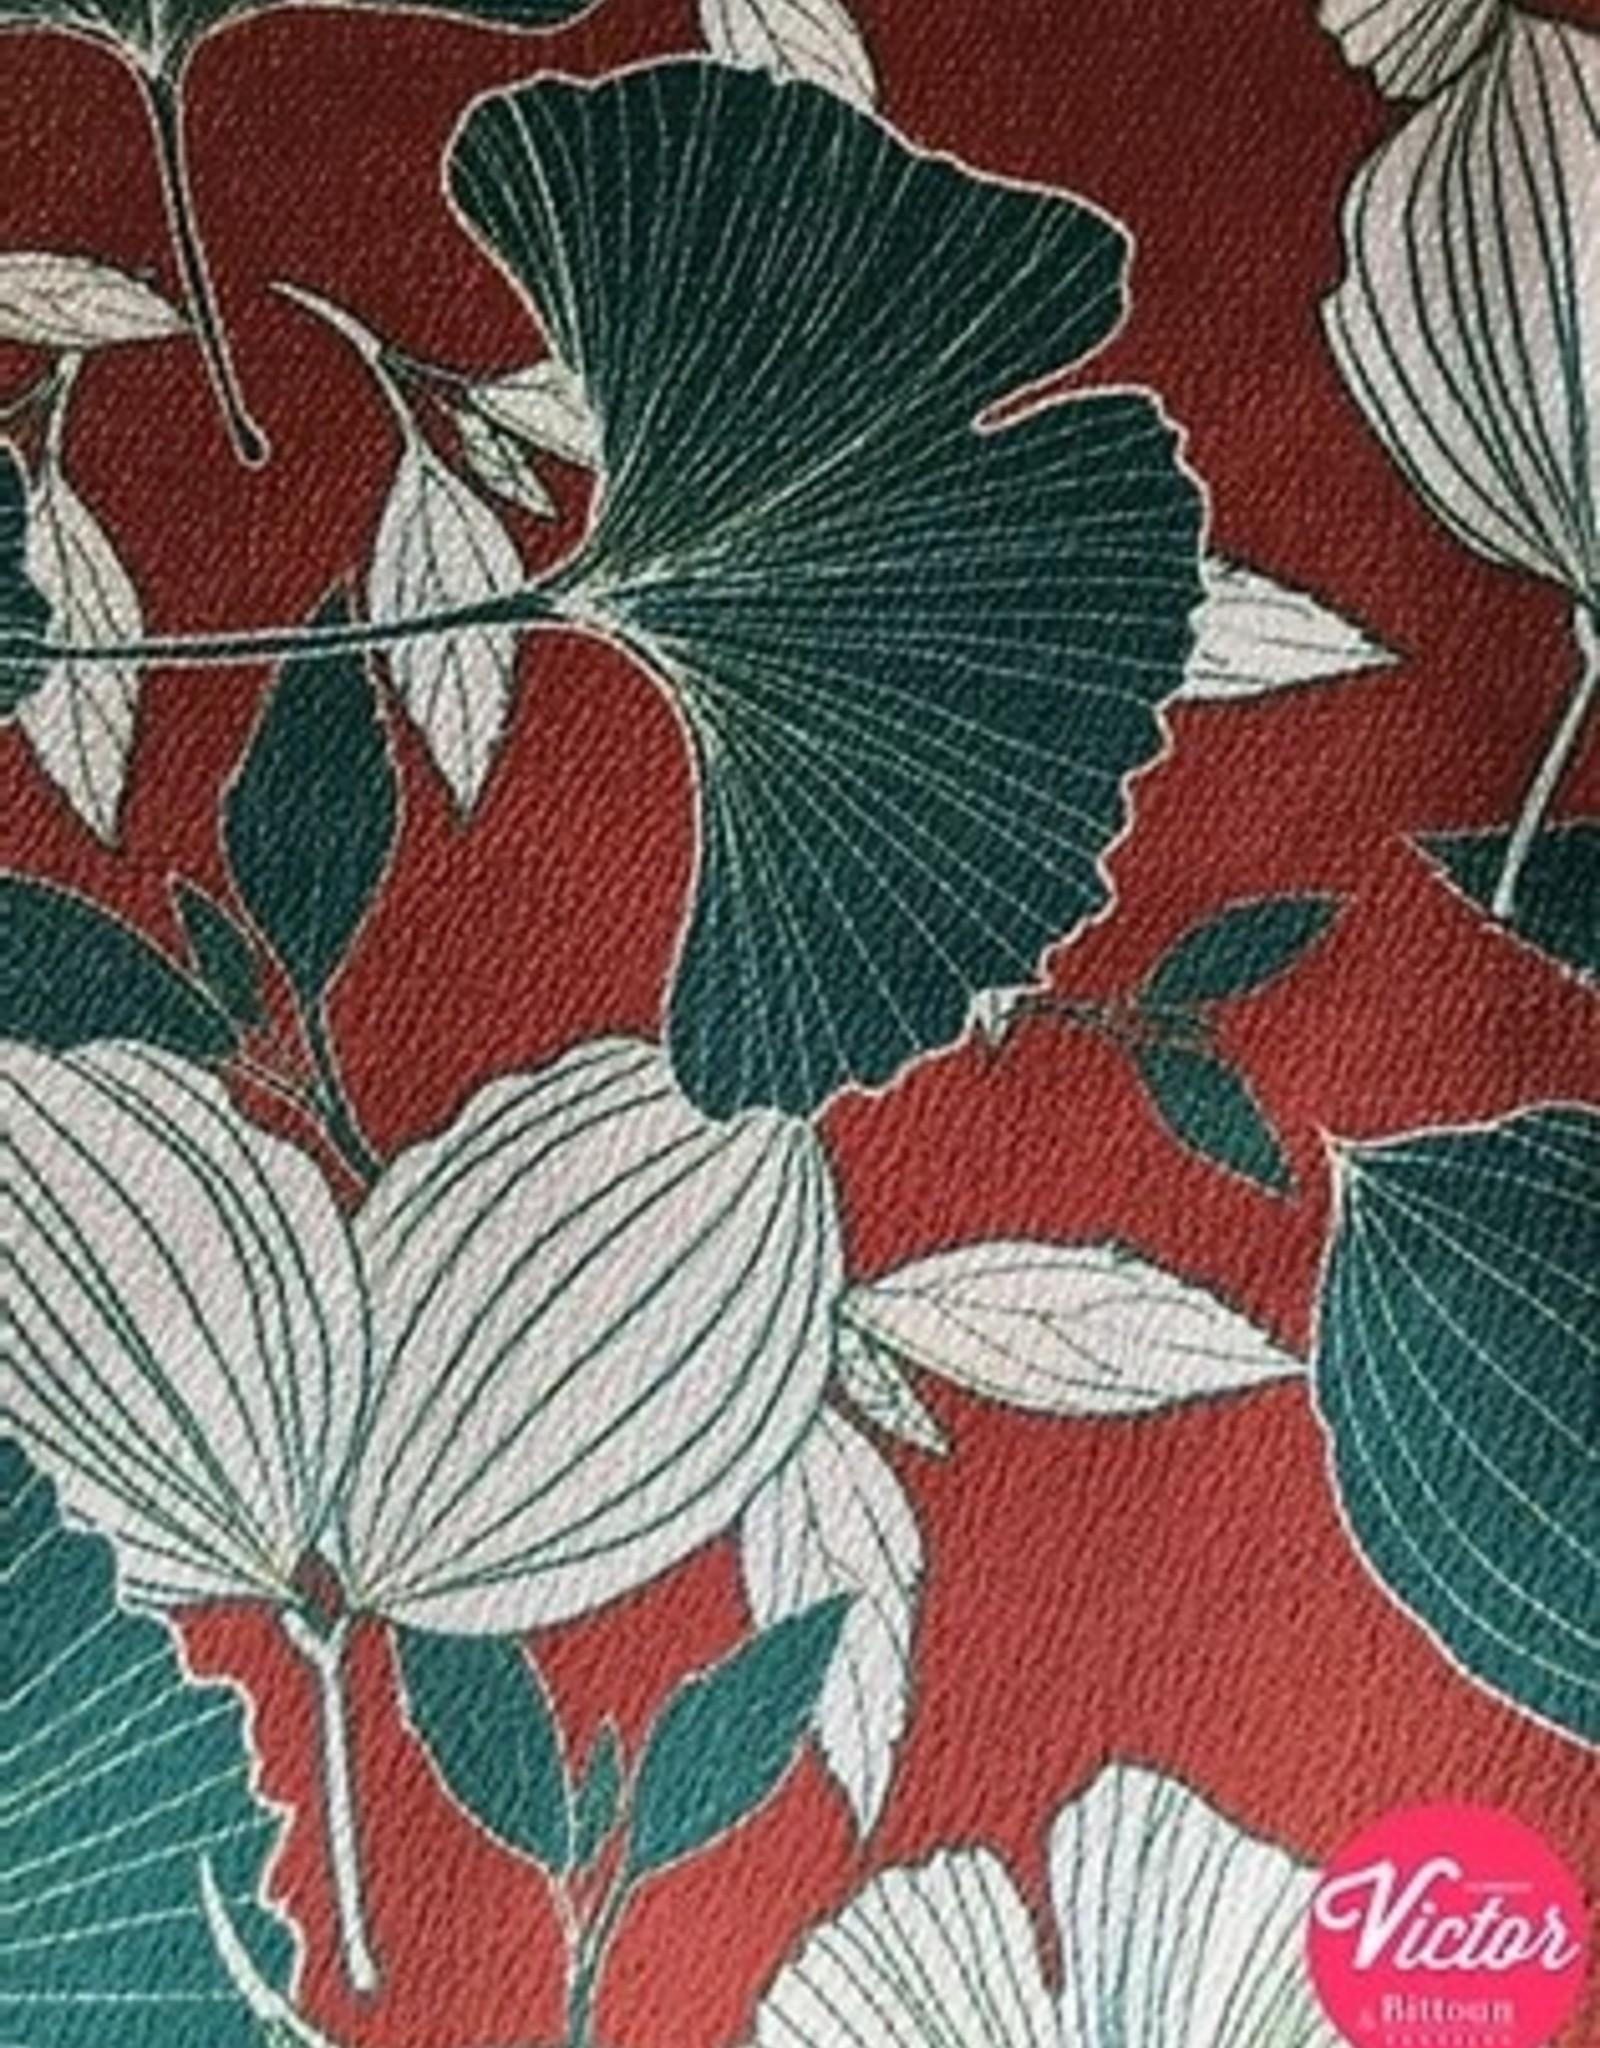 Bittoun Bittoun rood met groene en grijze  bloemen